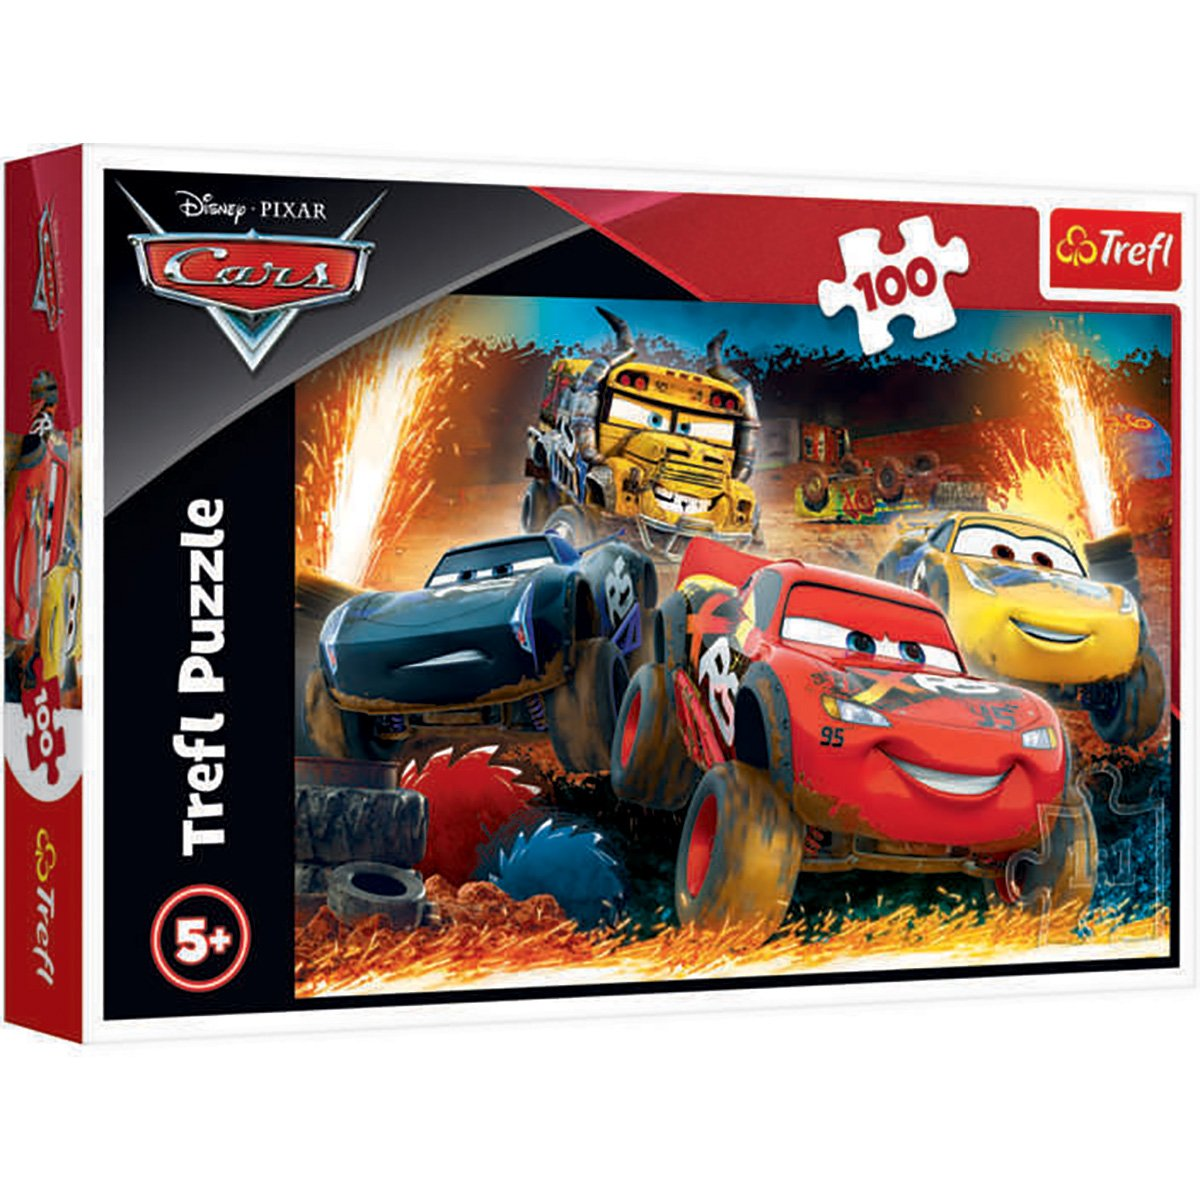 Puzzle Trefl, Disney Cars, Cursa extrema, 100 piese imagine 2021